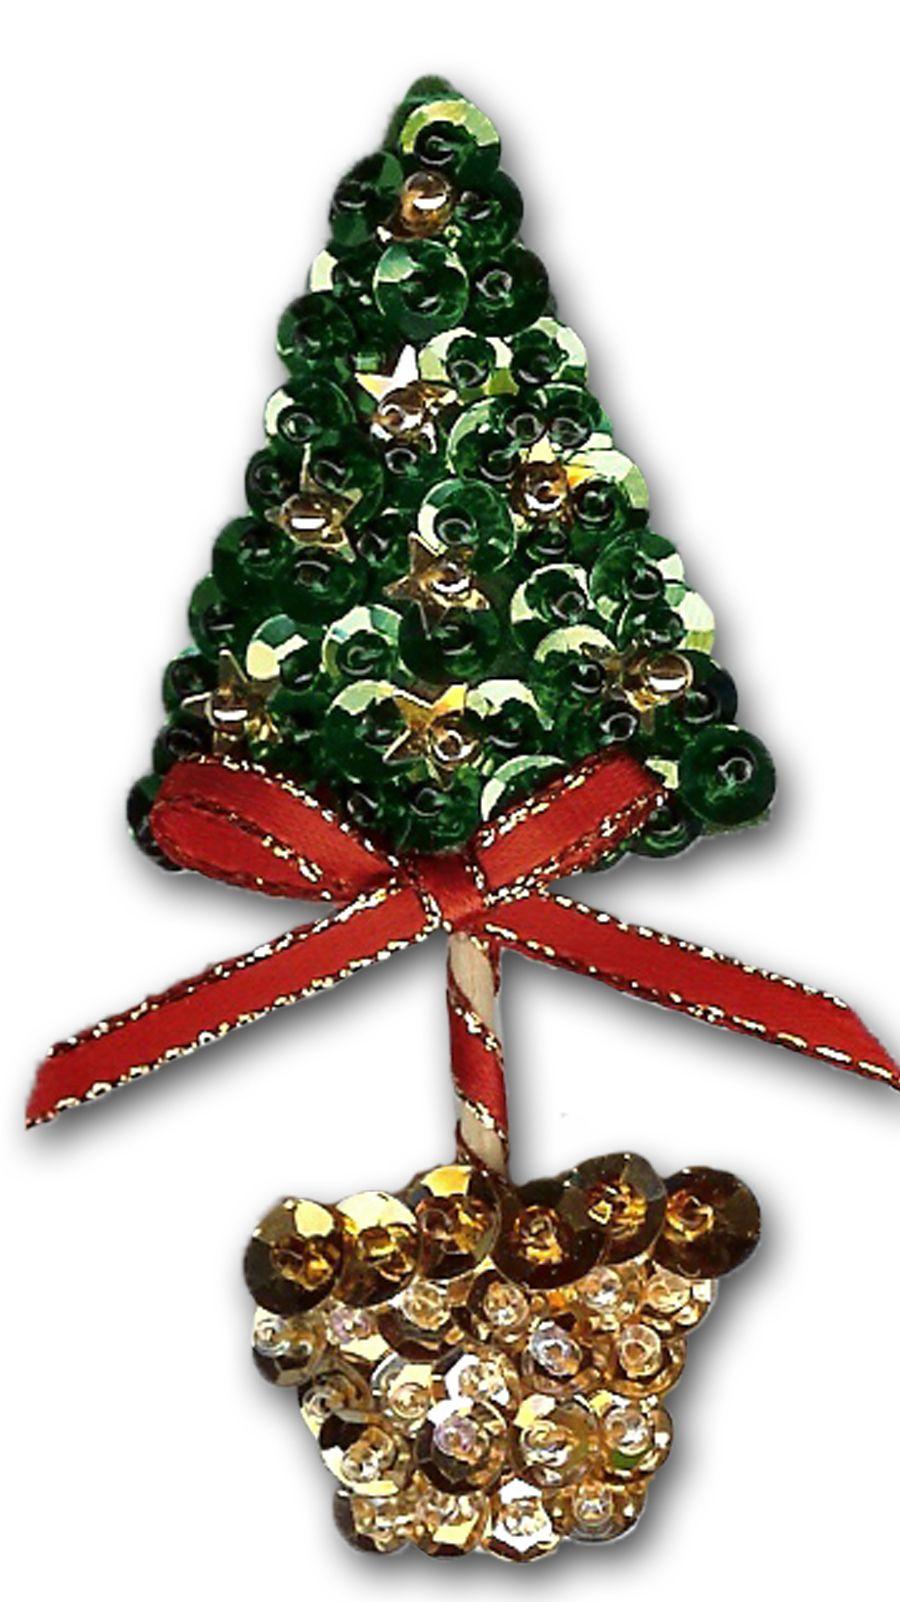 Charity League Pin 2005   Christmas ornaments, Holiday decor